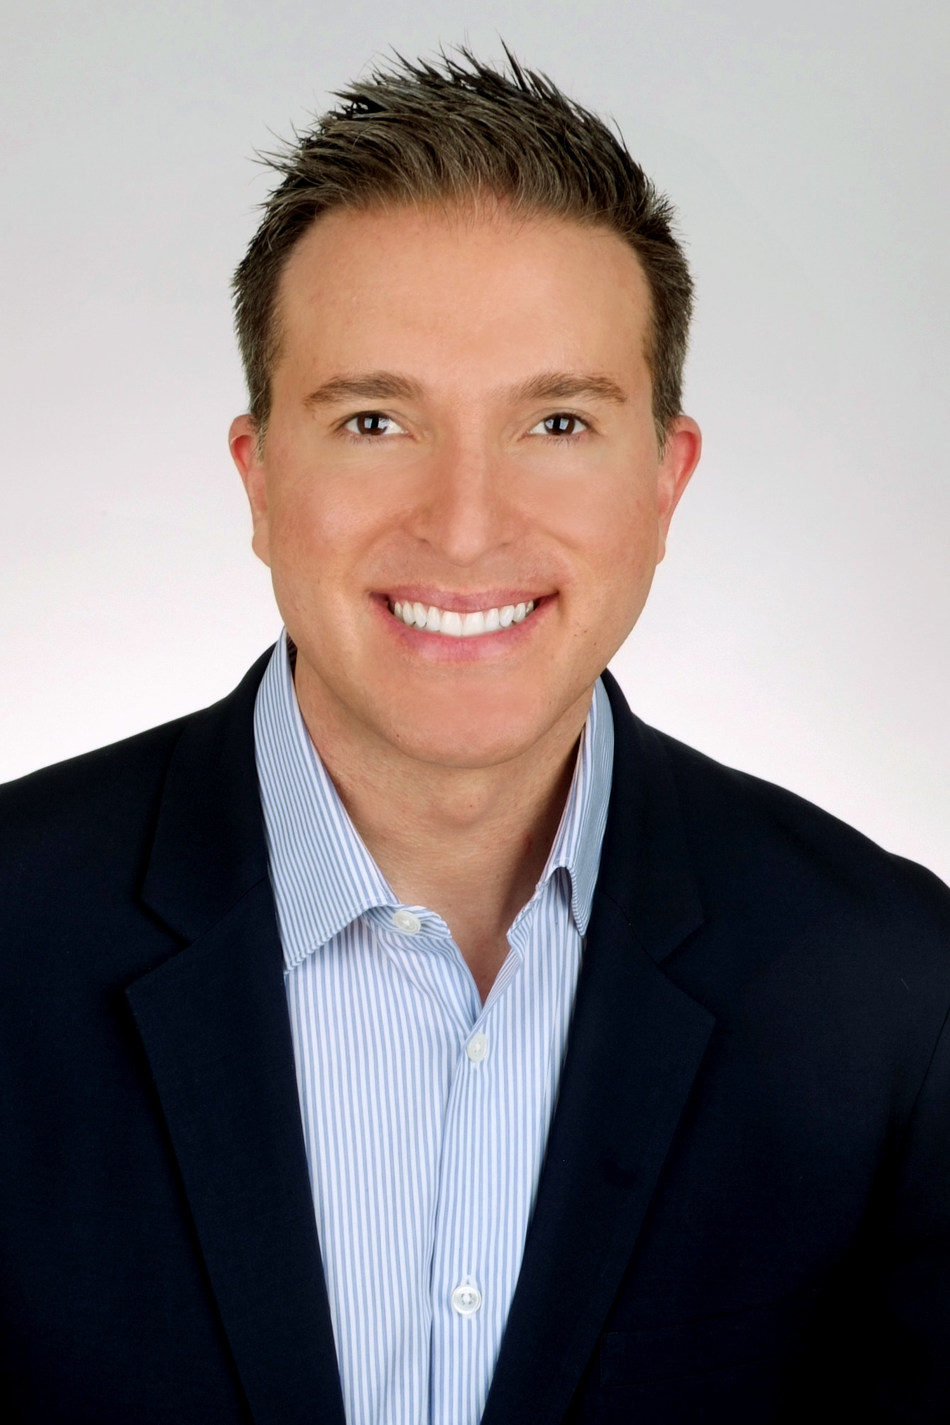 David Valenzuela - CEO Face Reality Inc